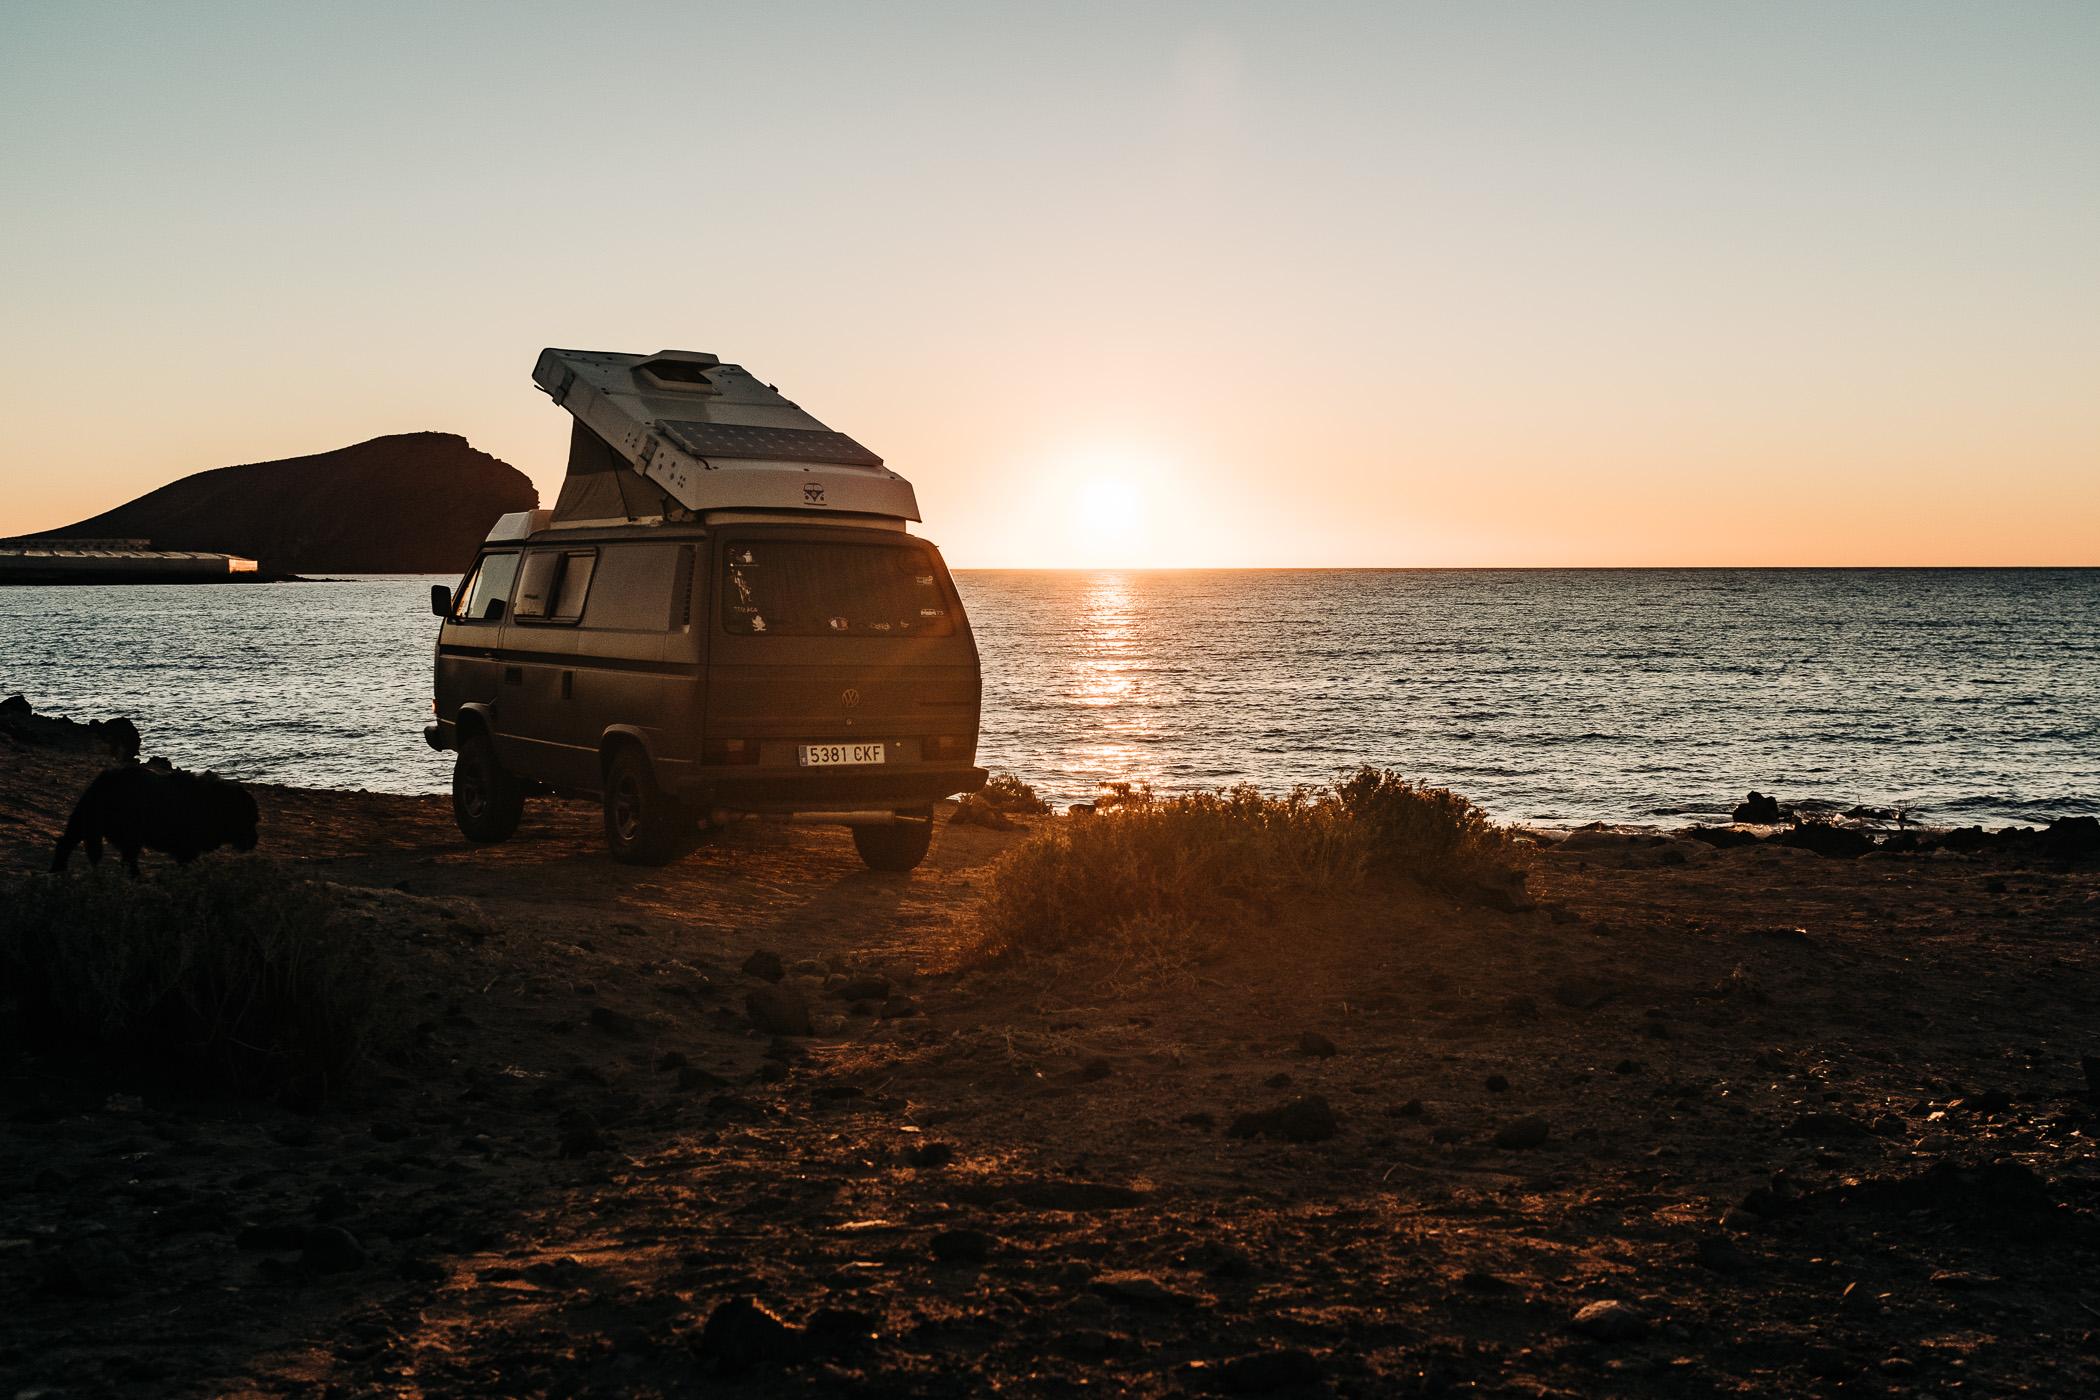 Bulli, Vintage van, Vanlife, VW T3, Camping, Florian Kresse, Photography, Stars, Milkyway, Sternenhimmel, Fotografie, Lifestyle